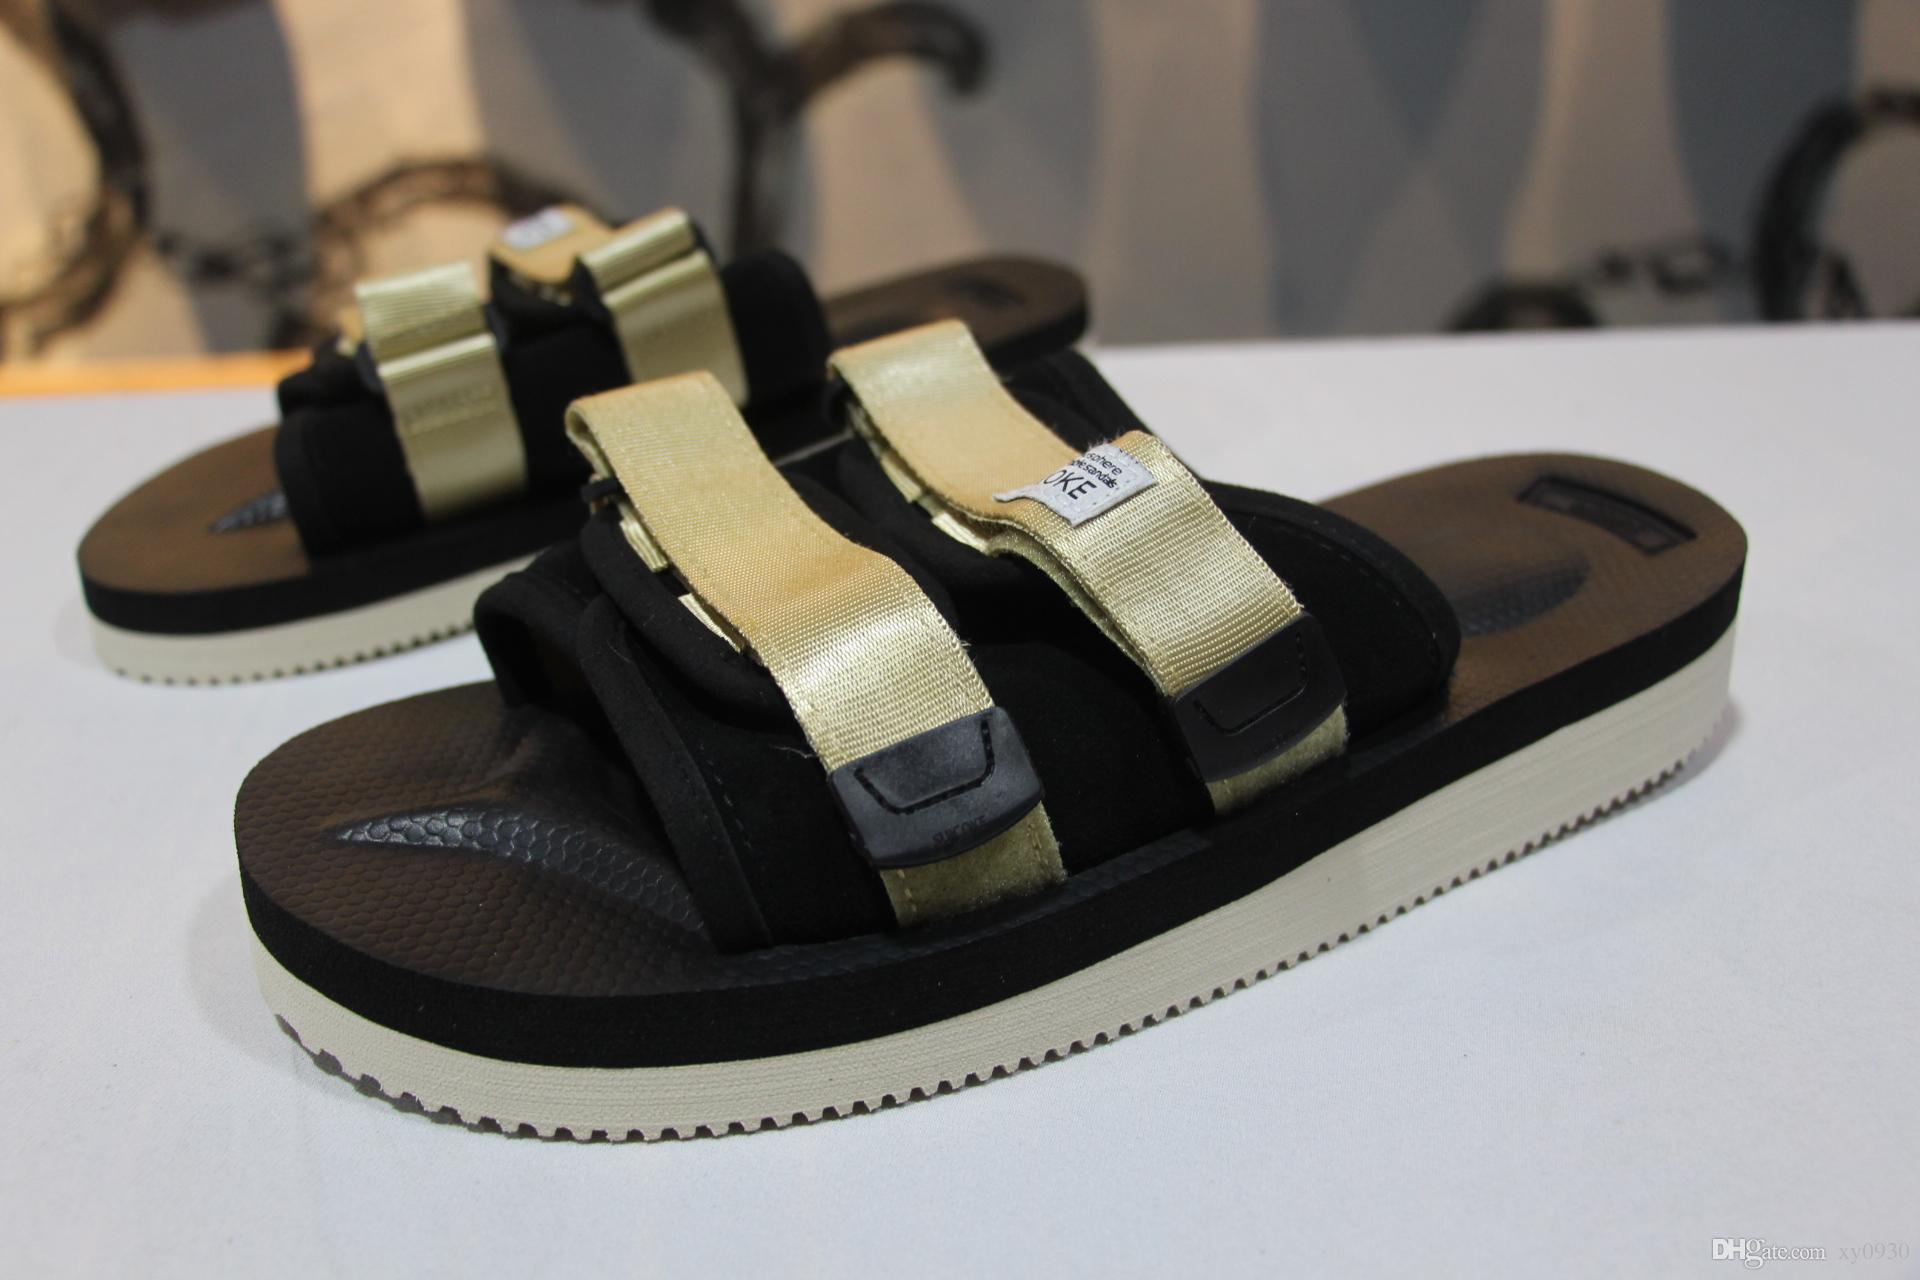 6e6dac65721e New Top Quality Red CLOT X SUICOKE OG-056STU MOTO-STU Summer Trip Fest  Black Gold Silk Sole Sandal Slides SUICOKE KISEEOK-044V Slippers Sandal  SNEAKERS ...